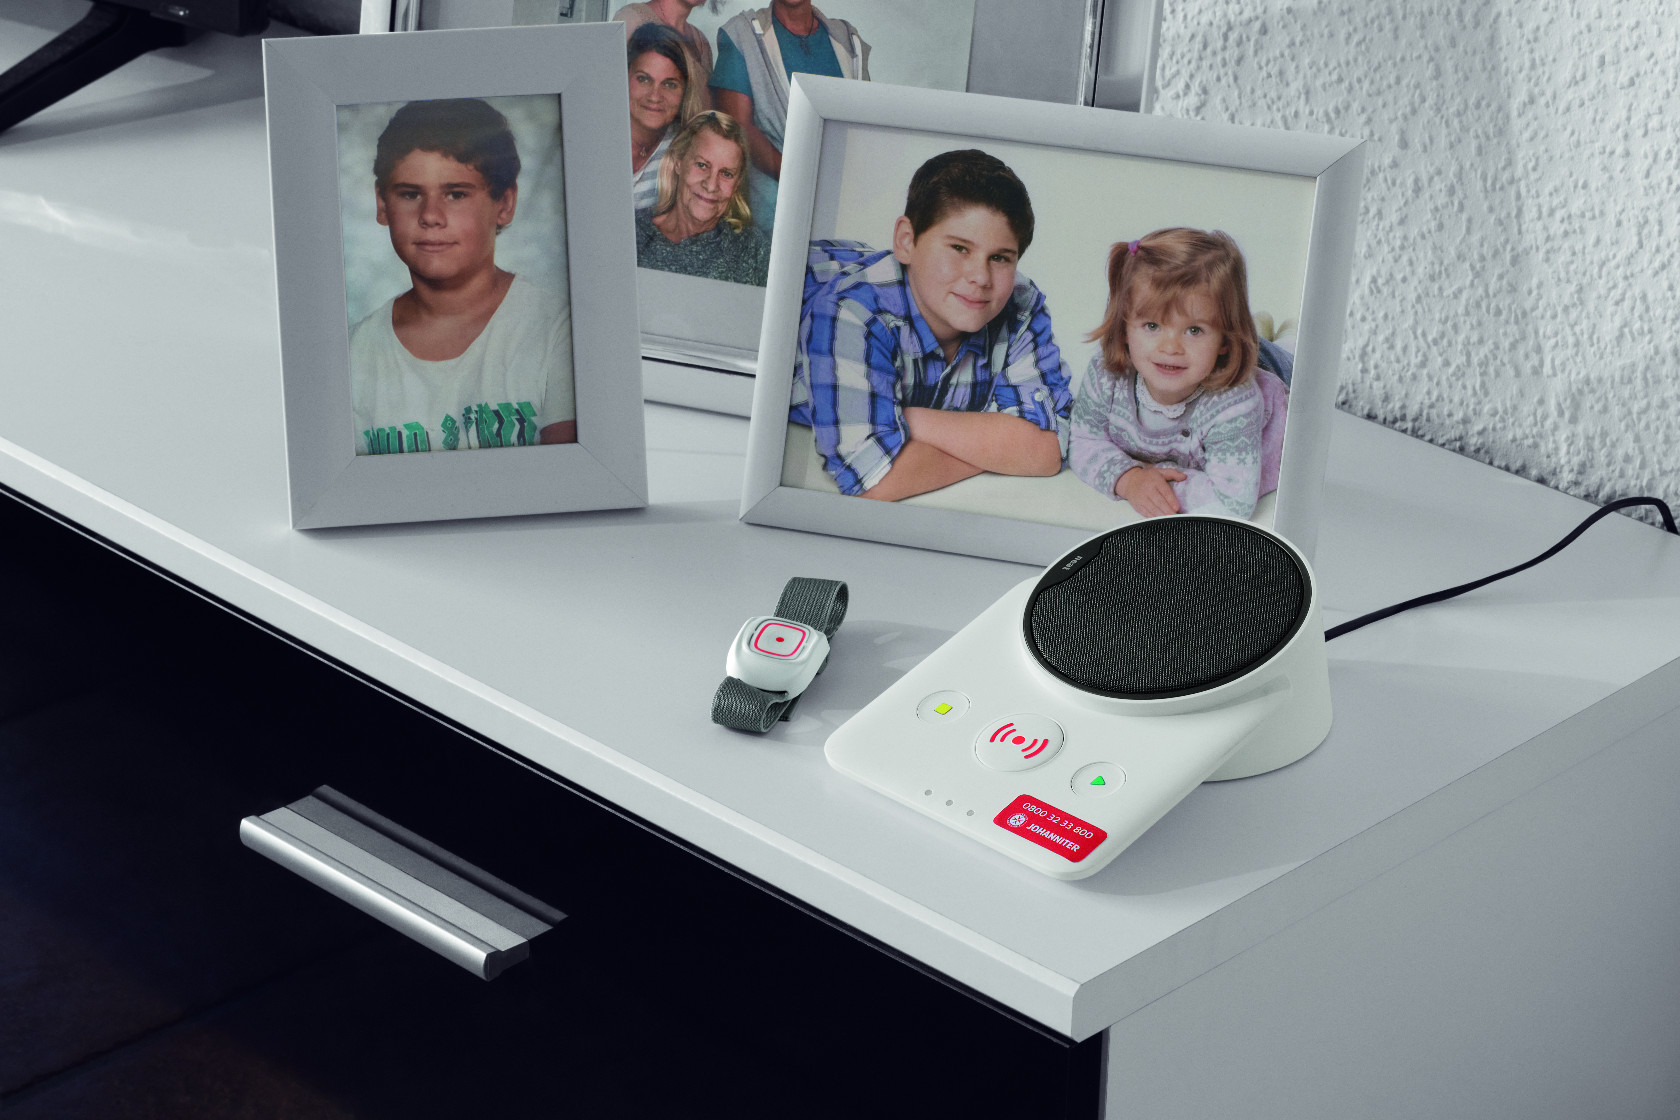 Johanniter-Hausnotruf-Geräte: Basistation und Armband